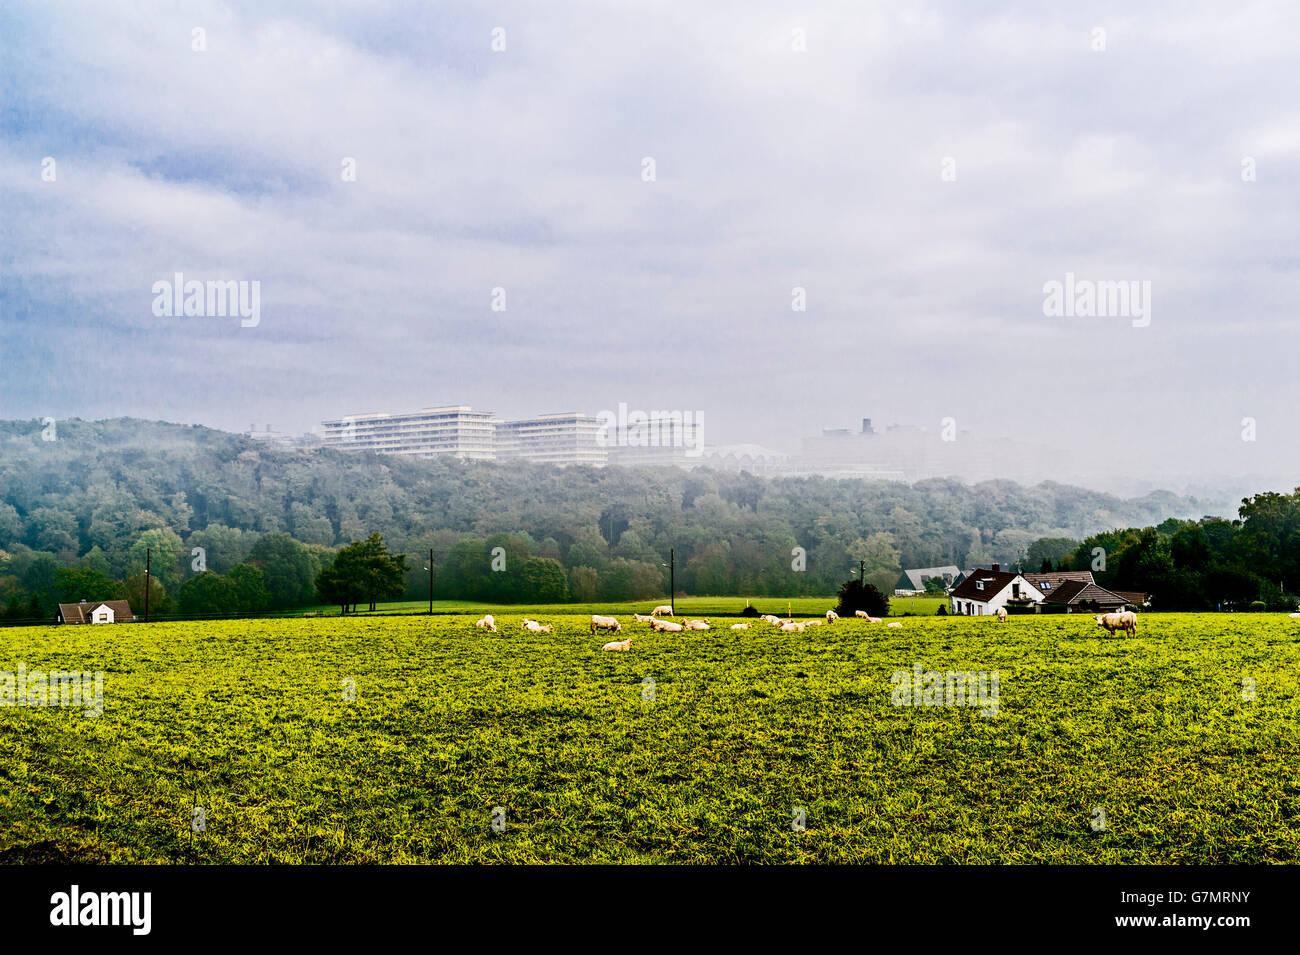 Foggy view at the University in Bochum, ruhr area, Germany; Blick auf die Ruhr Universitaet Bochum, vom Süden - Stock Image